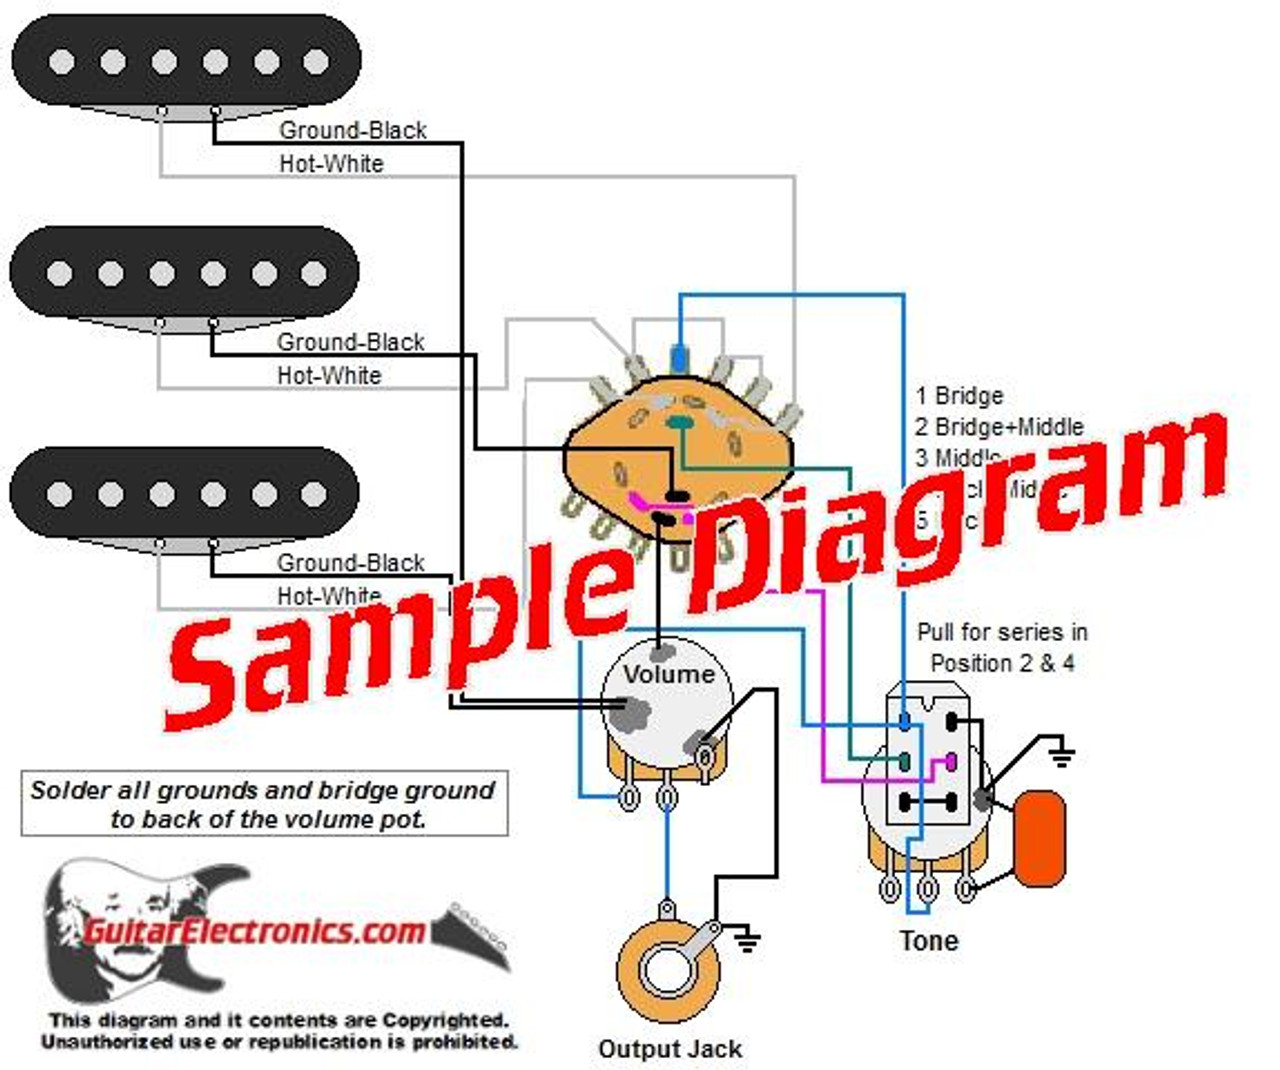 Rockfield Active Pickup Wiring Diagram | Wiring Diagram on